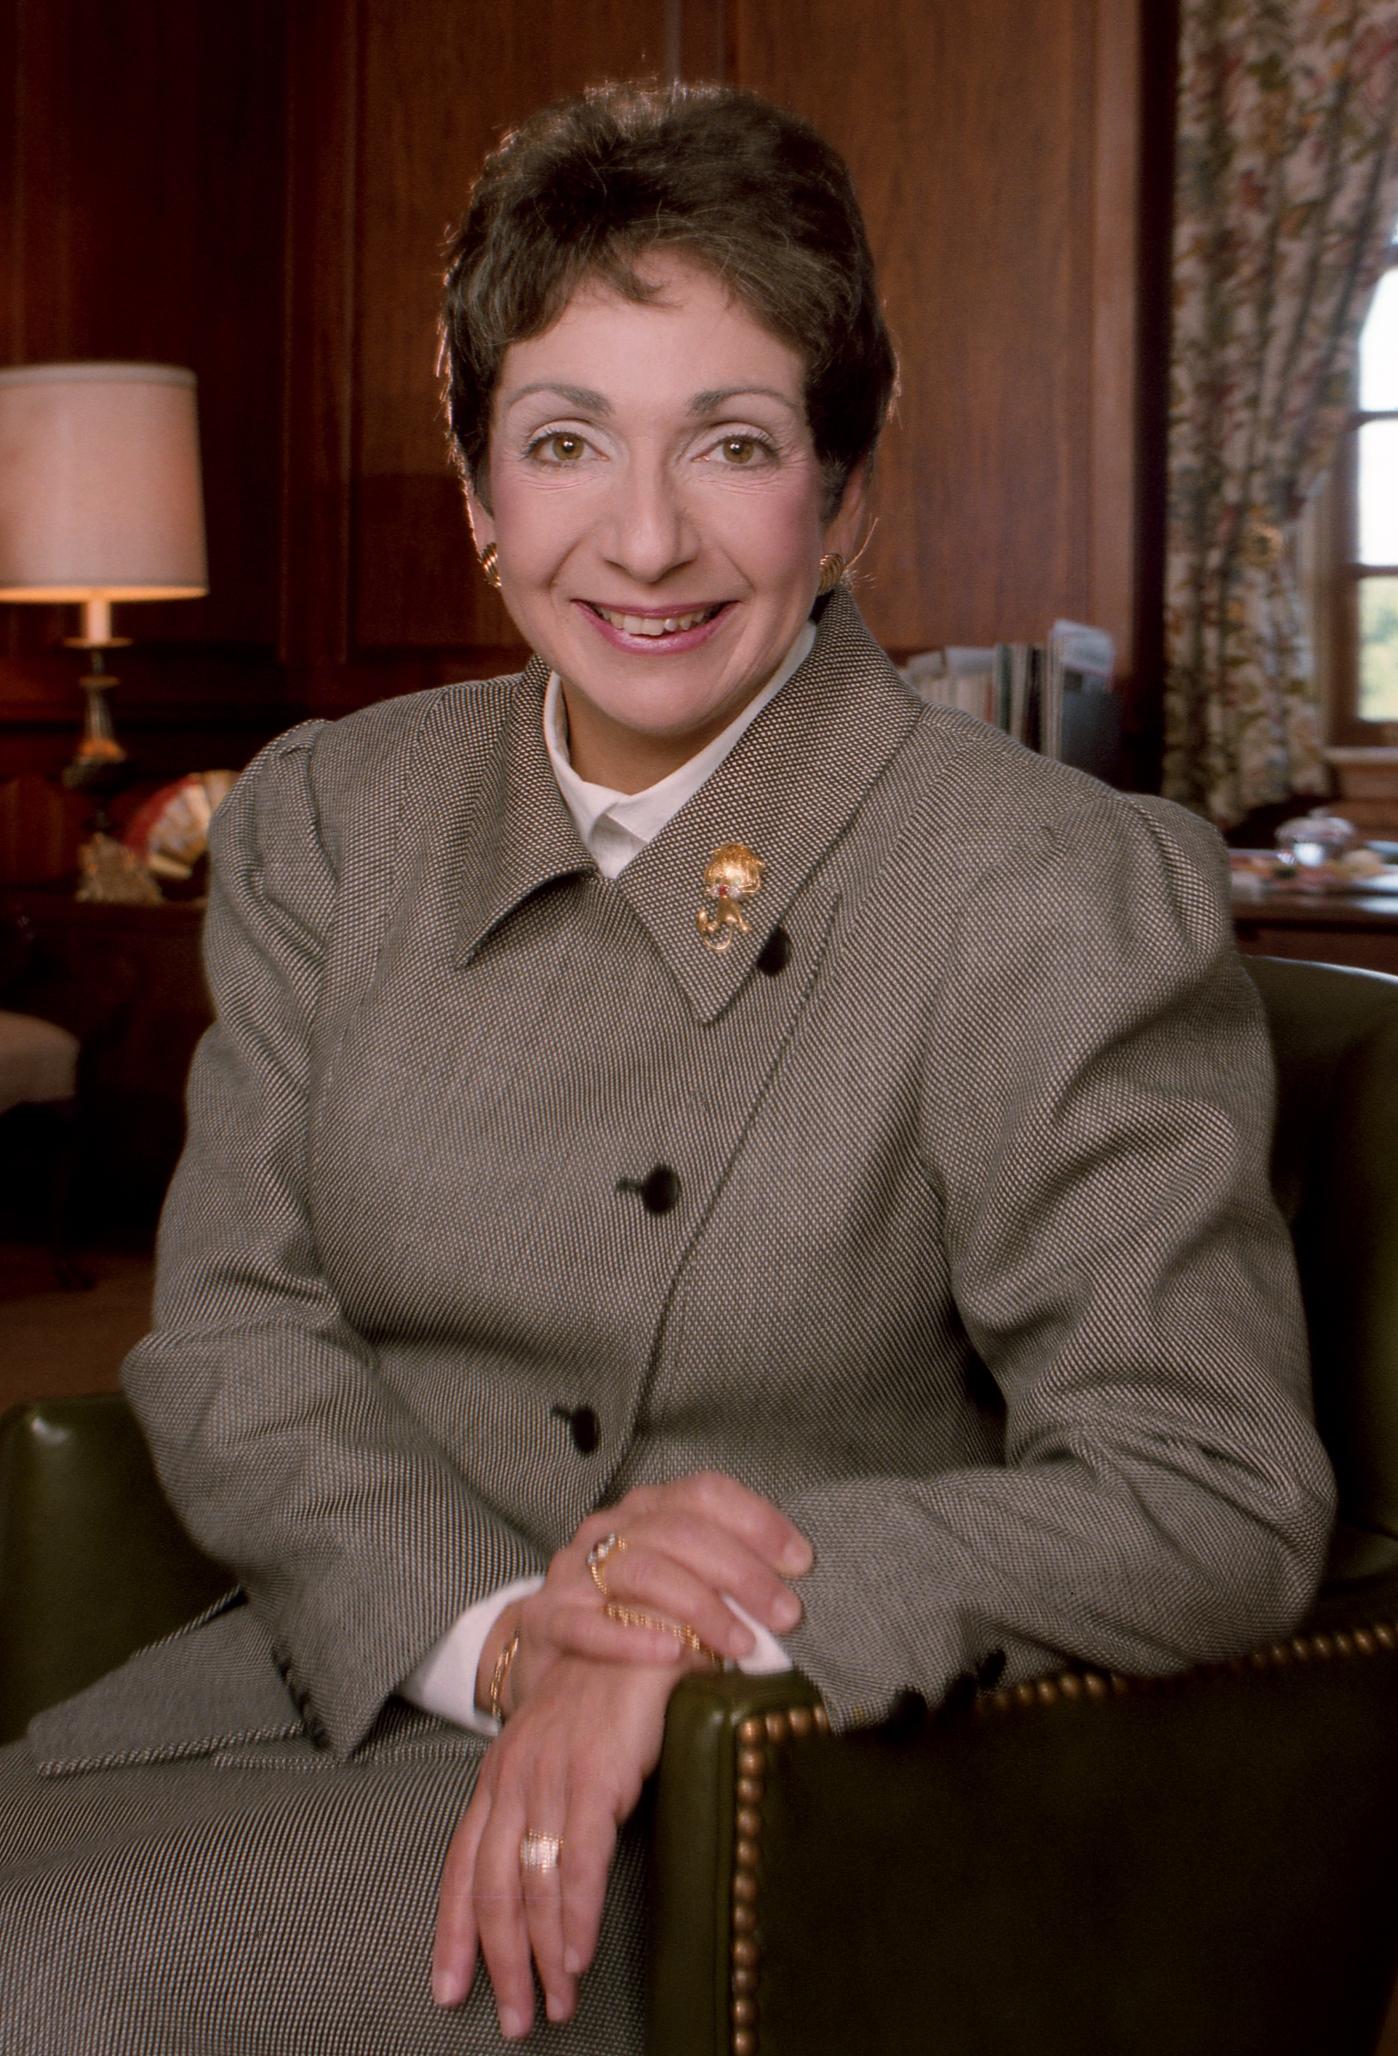 Mayoral portrait of Meyera E. Oberndorf, courtesy of William S. McIntosh.